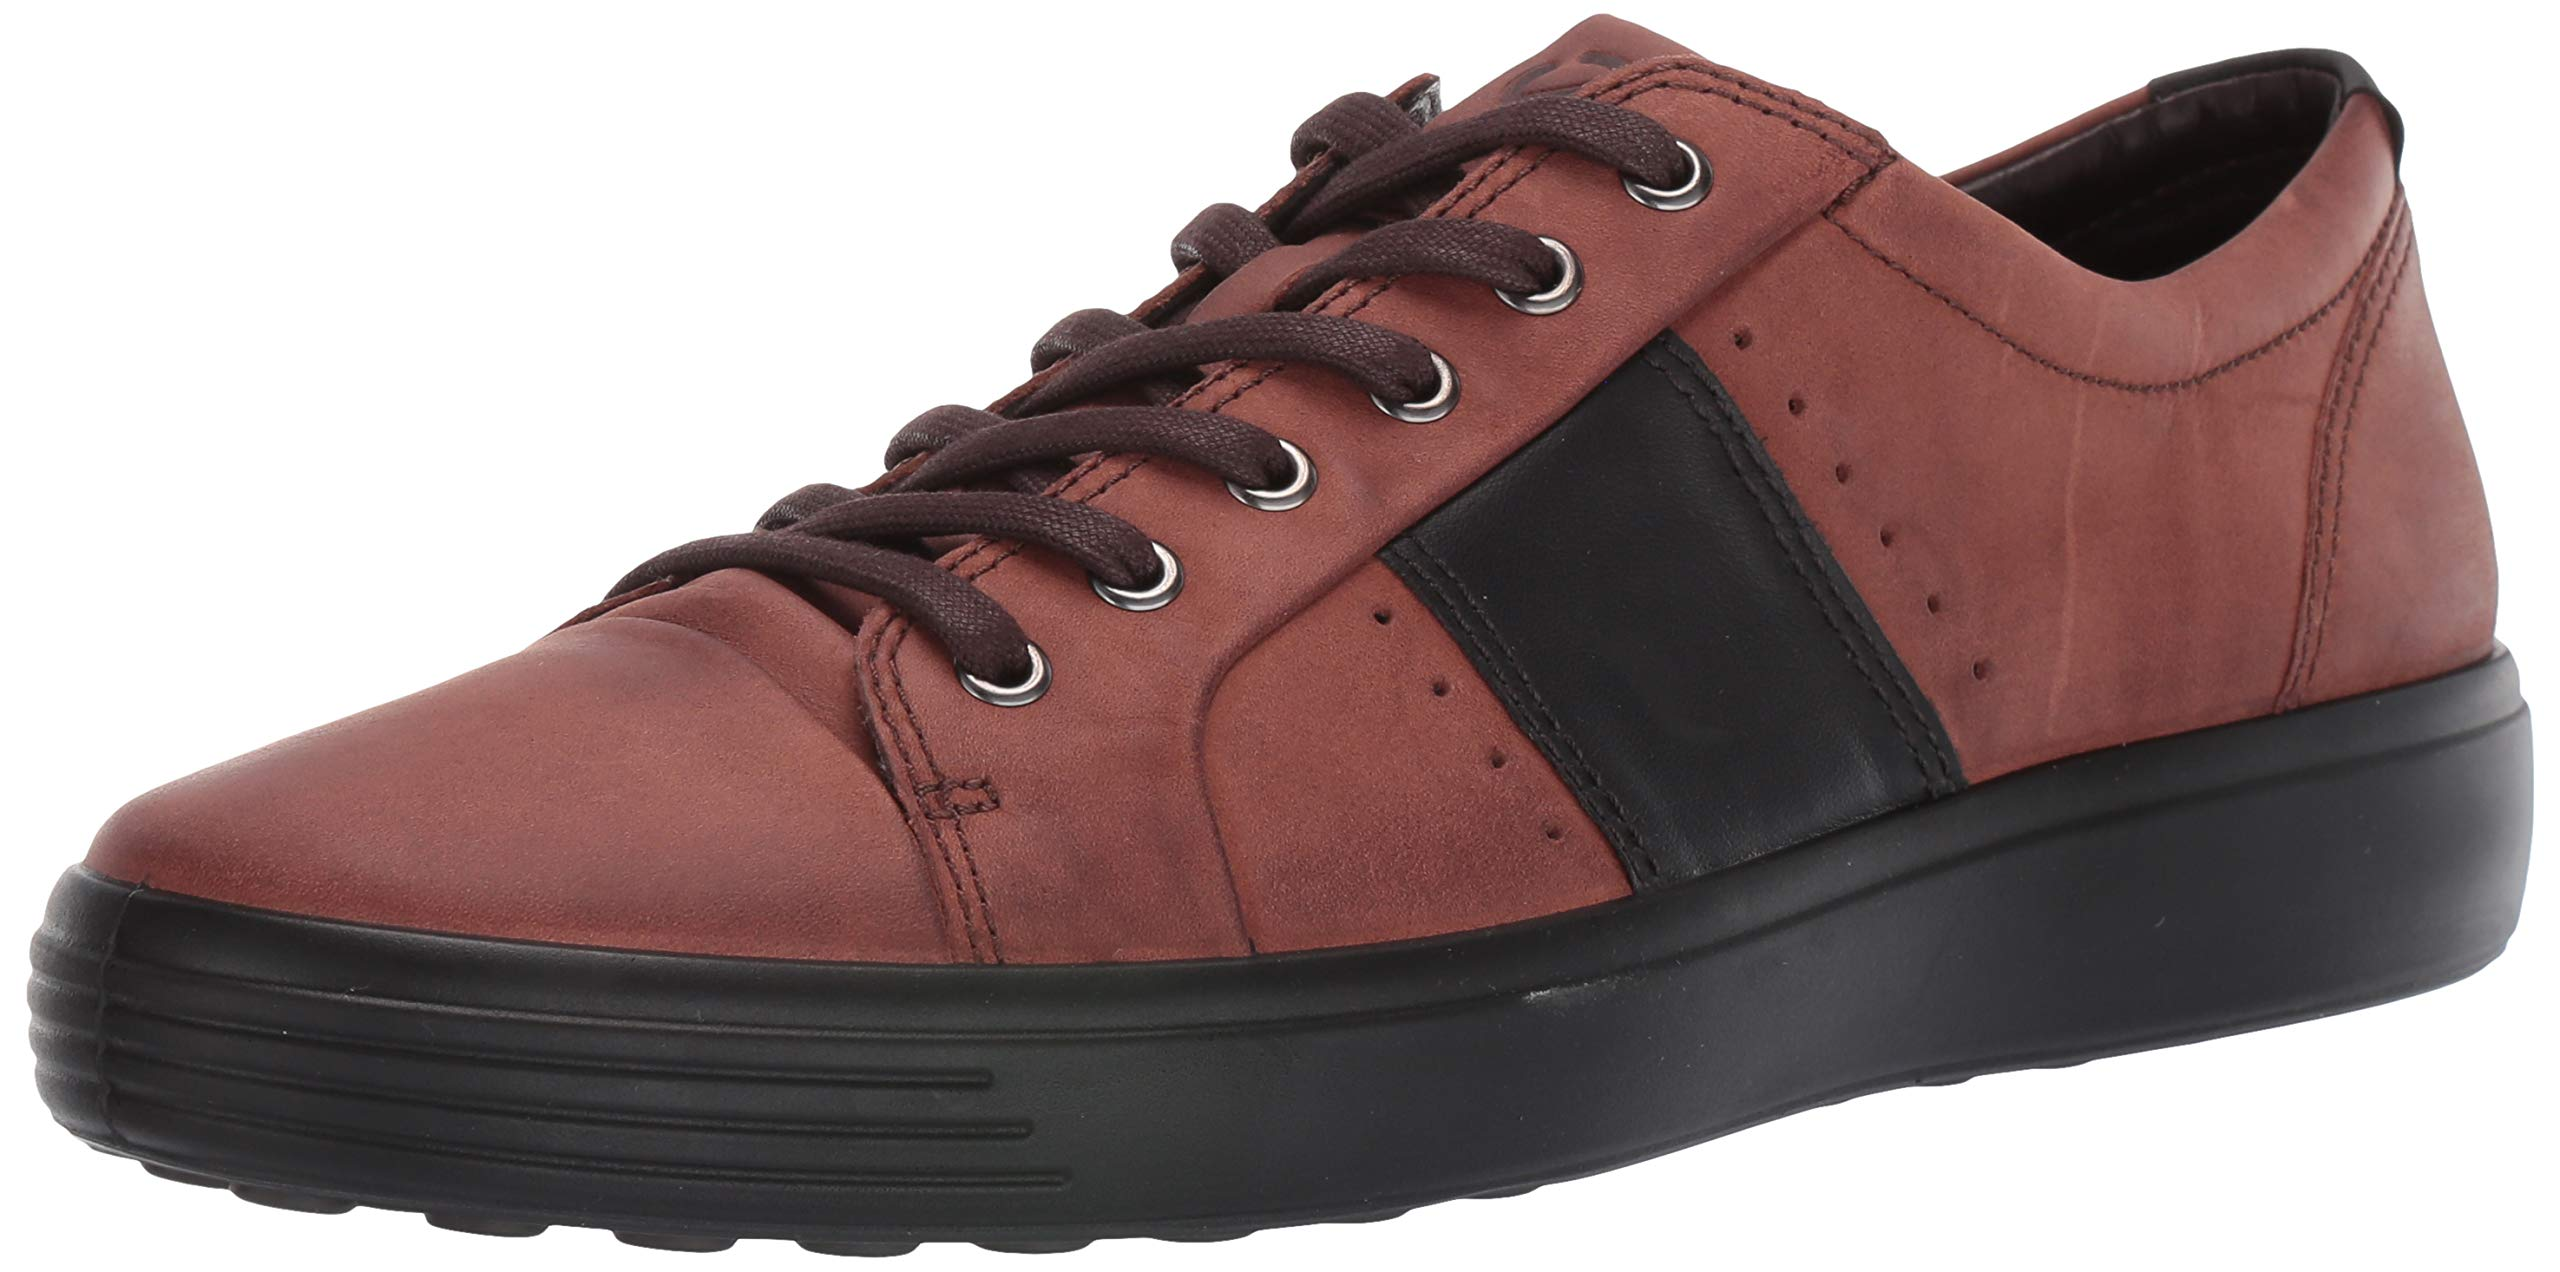 ECCO Sneaker Brandy Summer 13 13 5